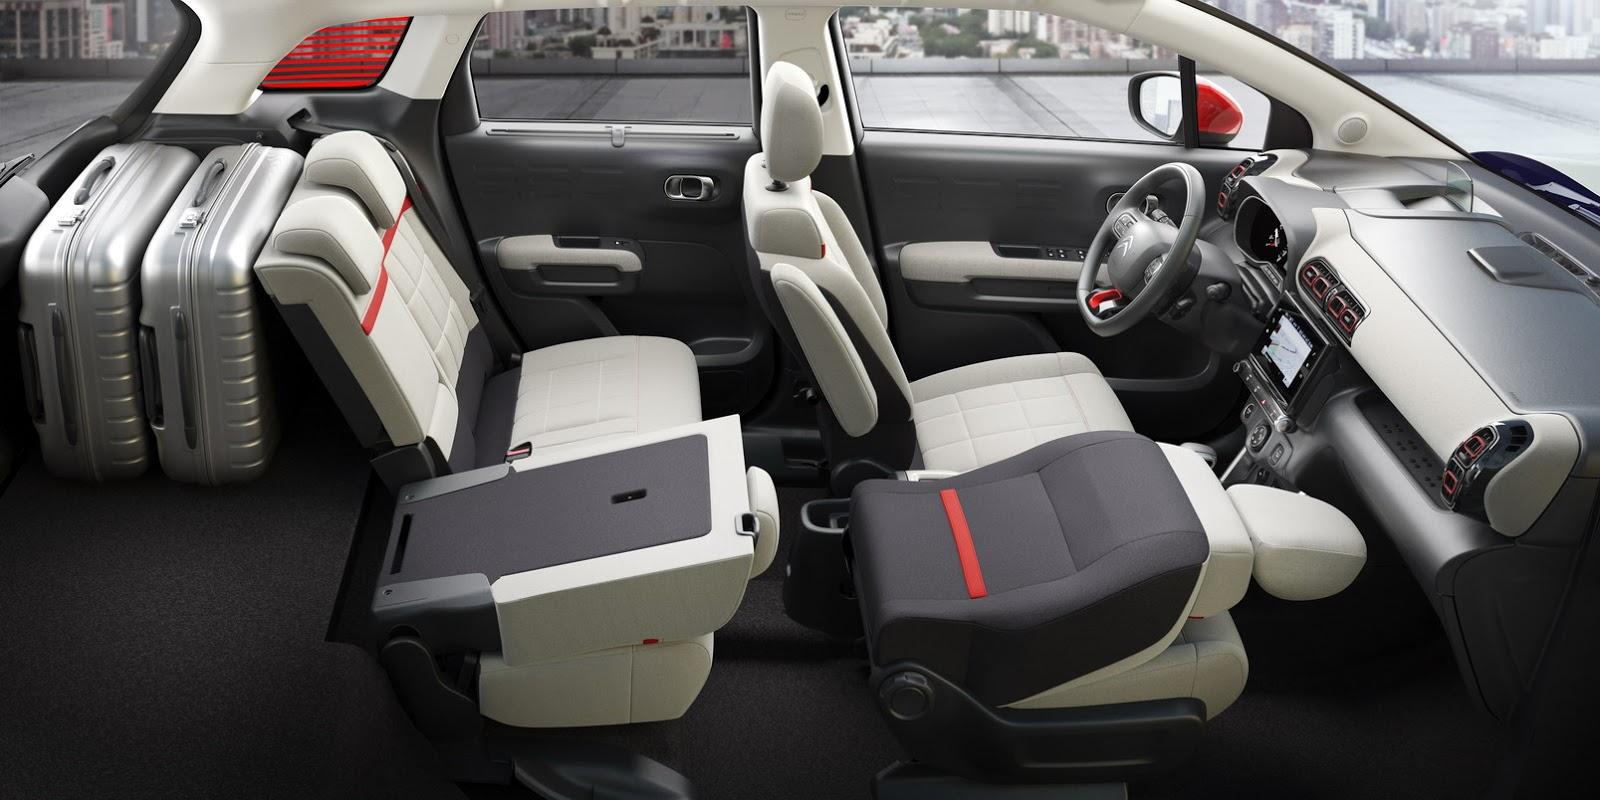 Citroen Presents C3 Picasso-replacing C3 Aircross - autoevolution